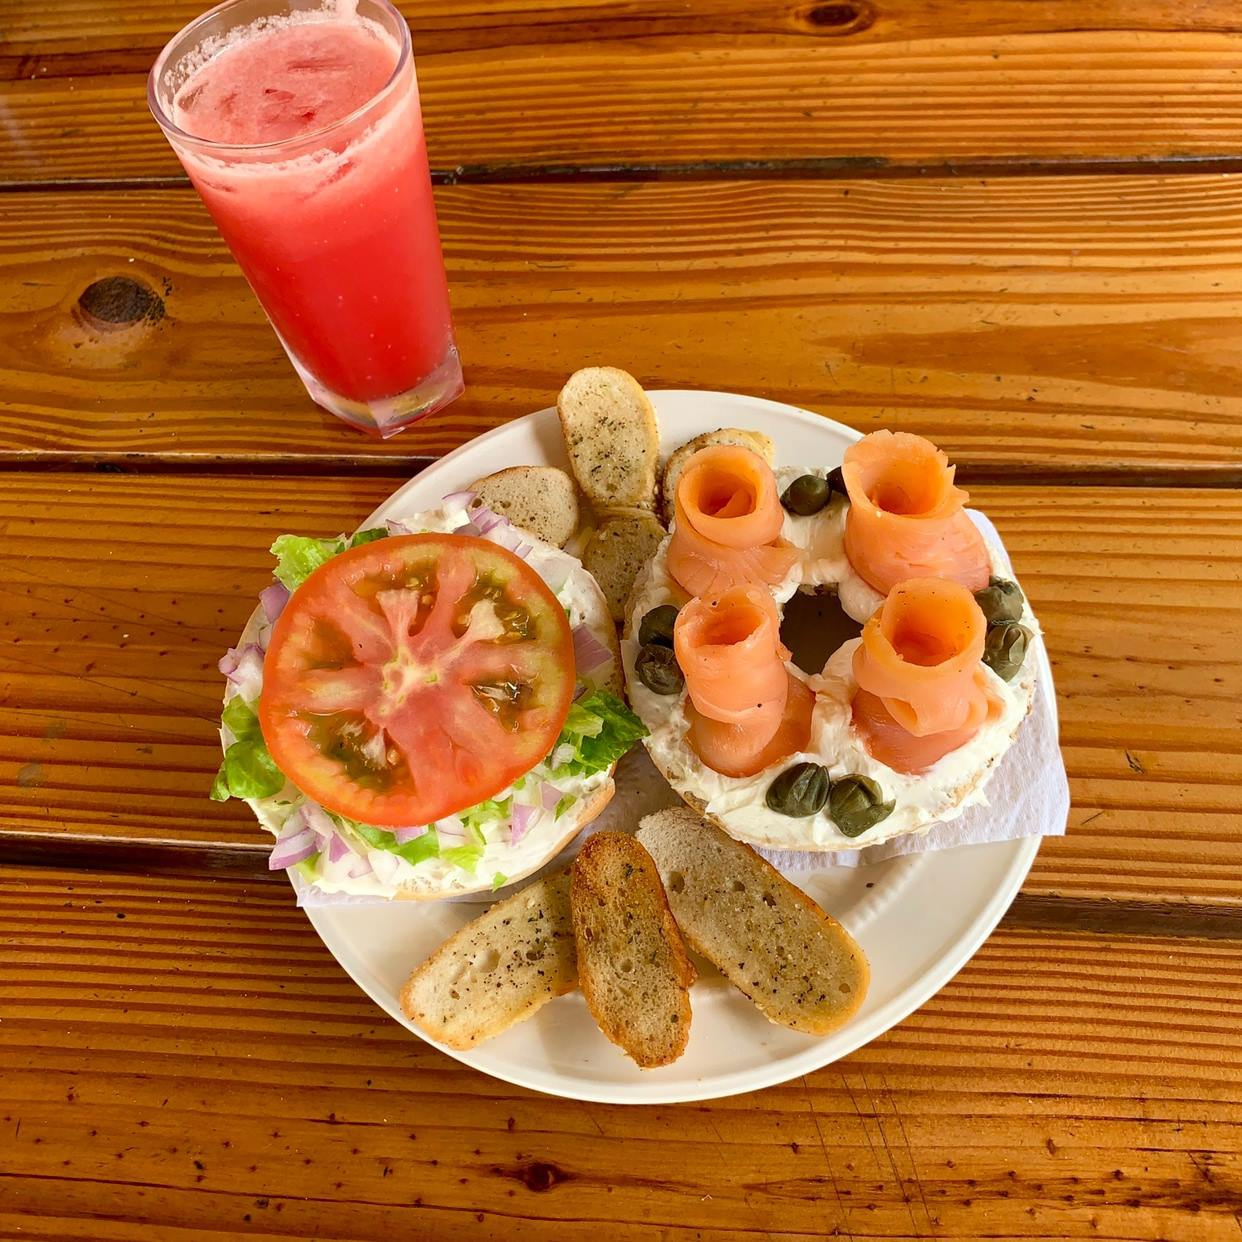 Best restaurants in Panama City, Panama for vegans